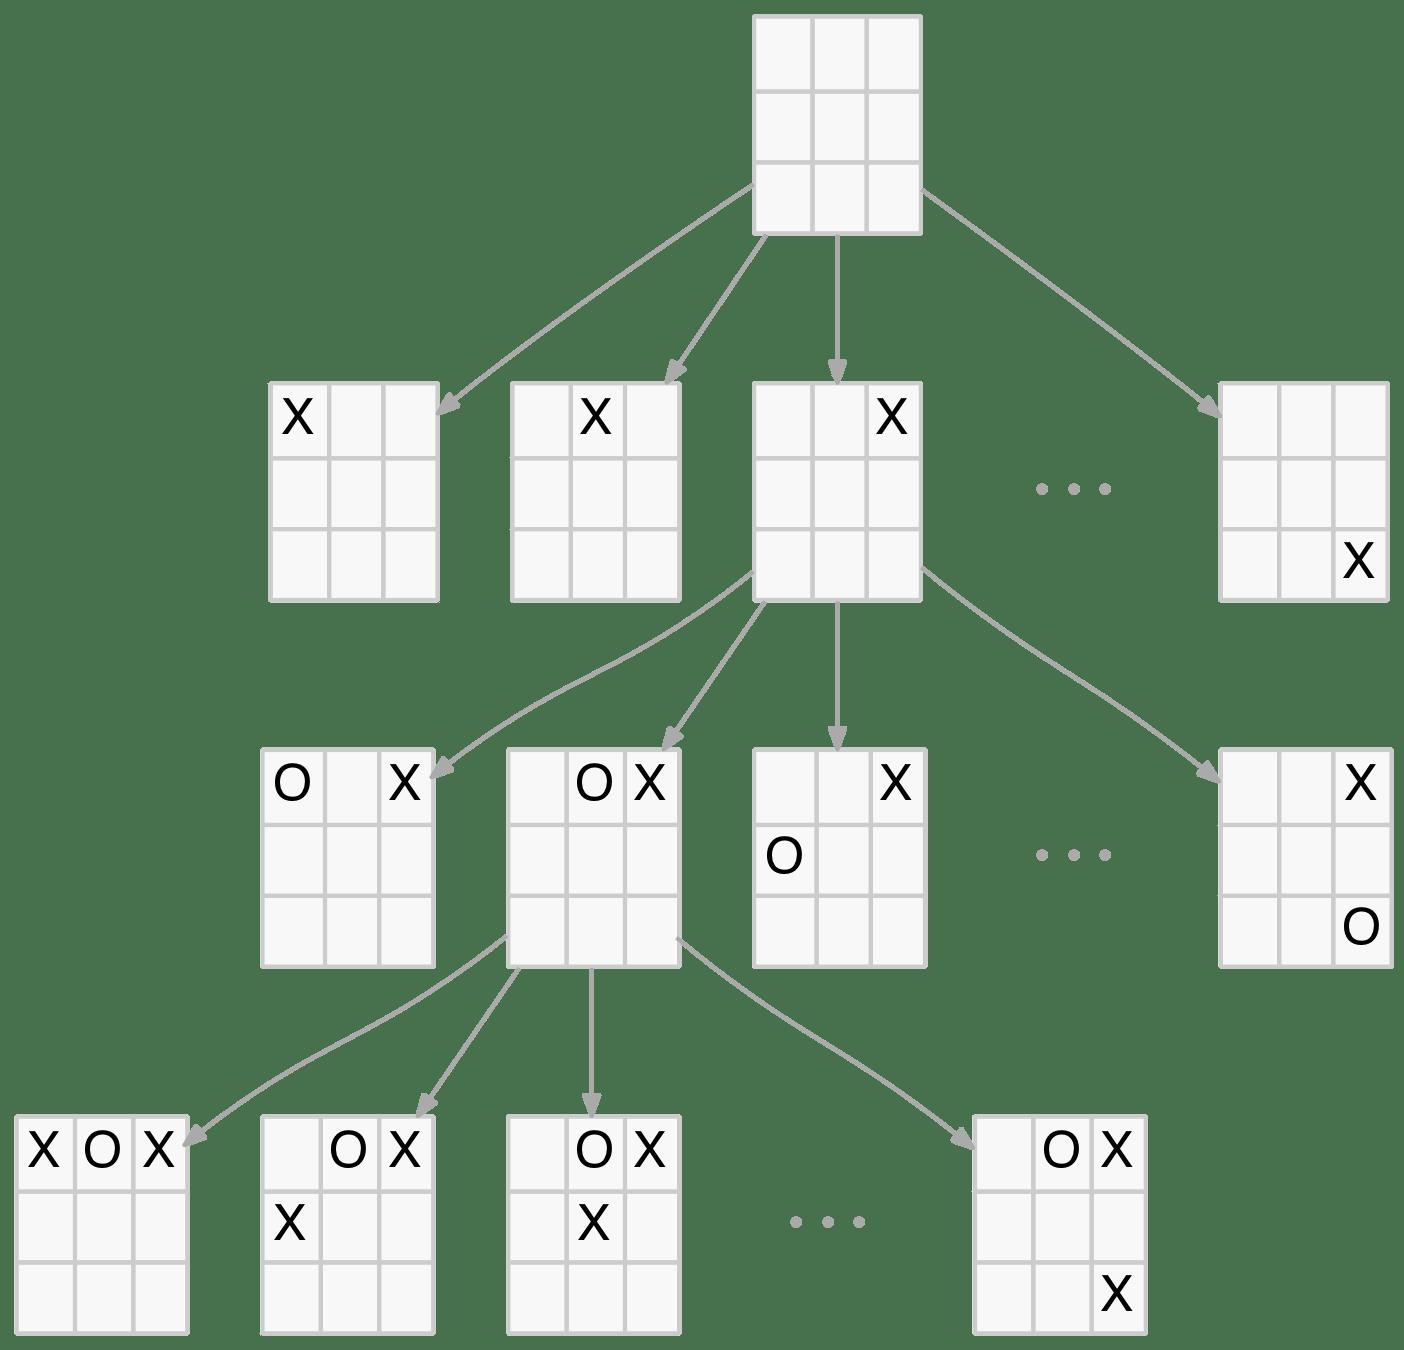 Tic Tac Toeysis Using Clojure Part 1